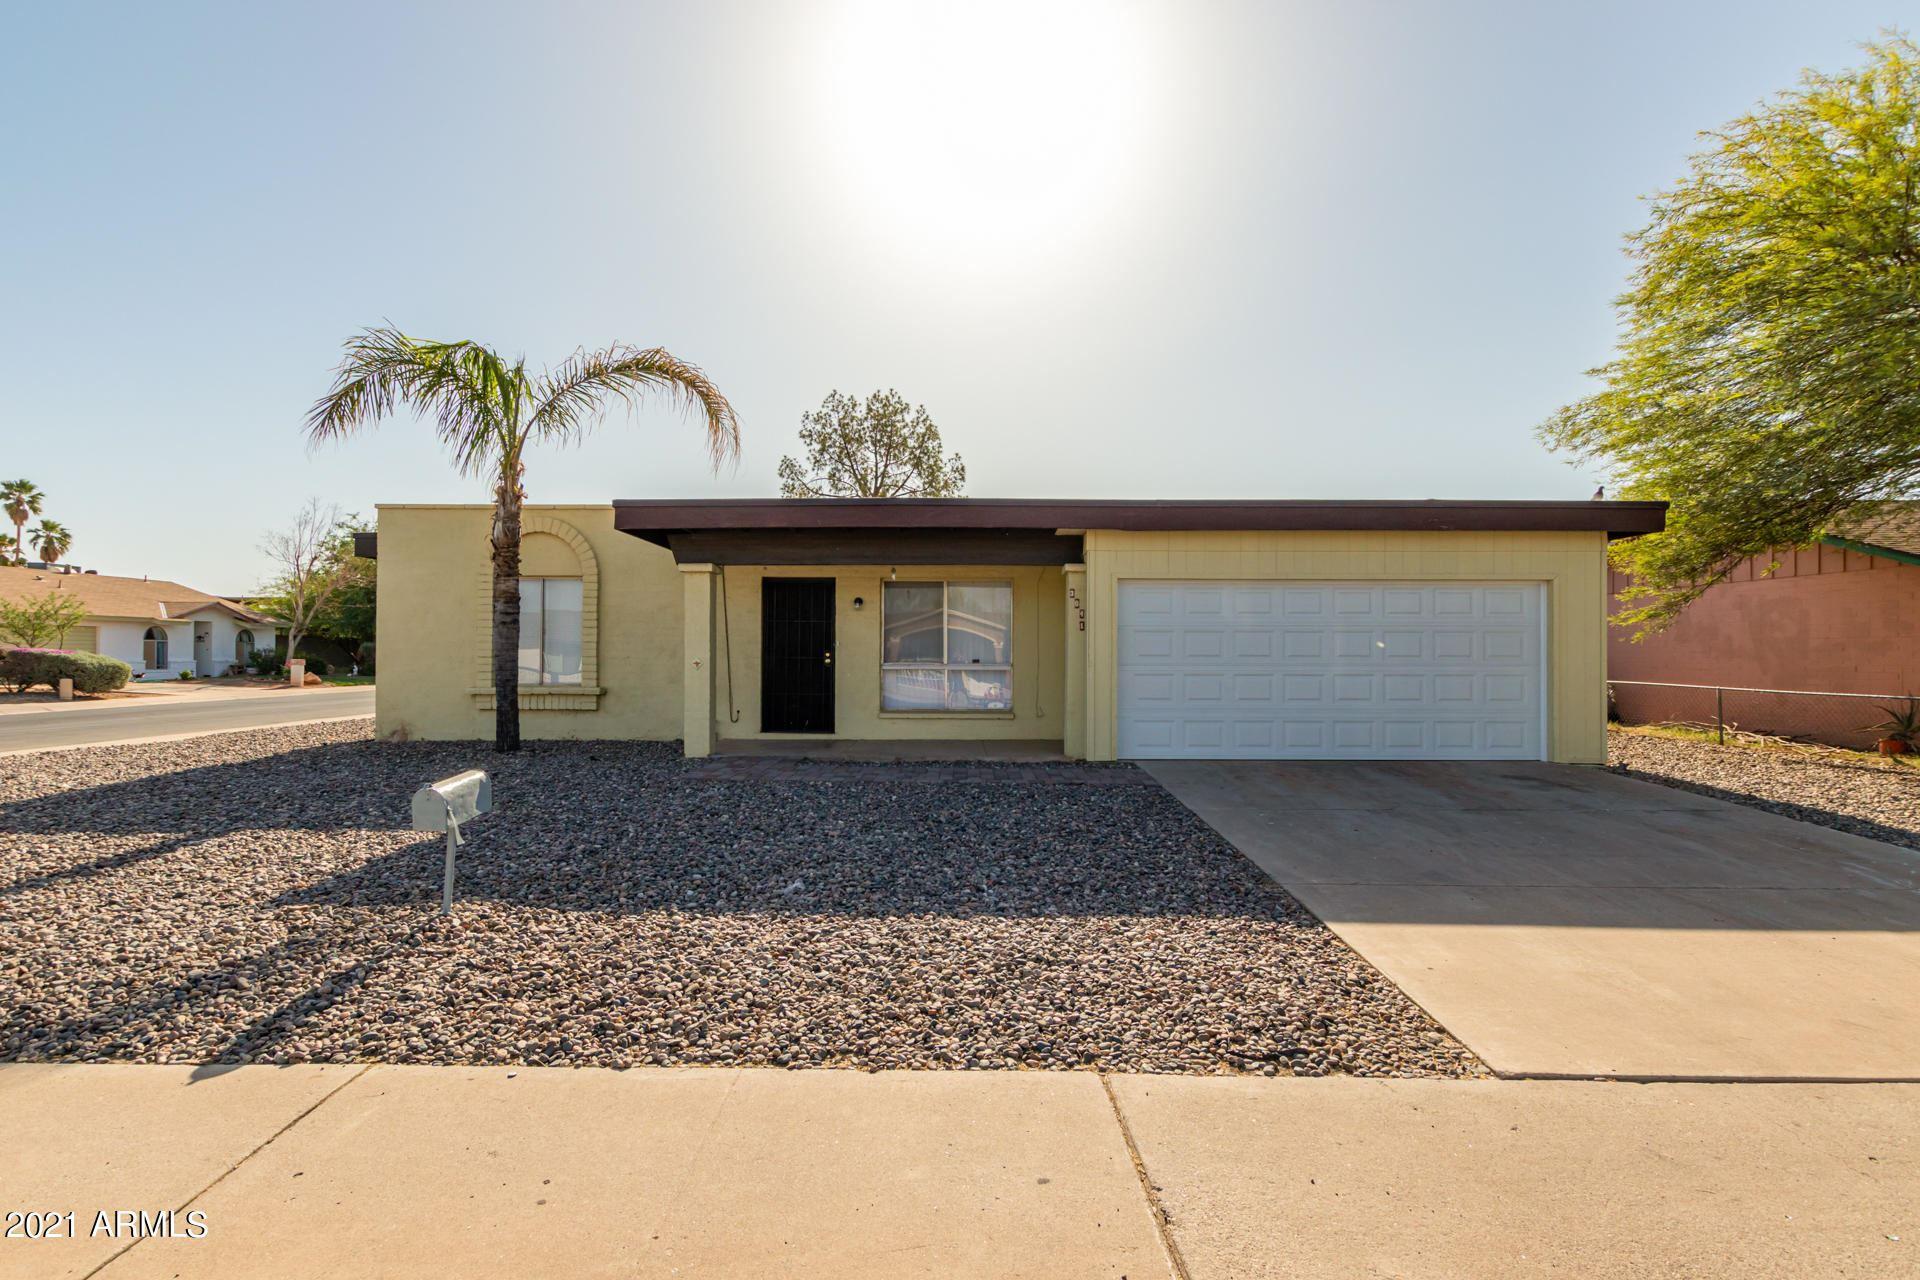 3041 N 87TH Avenue, Phoenix, AZ 85037 - MLS#: 6231900